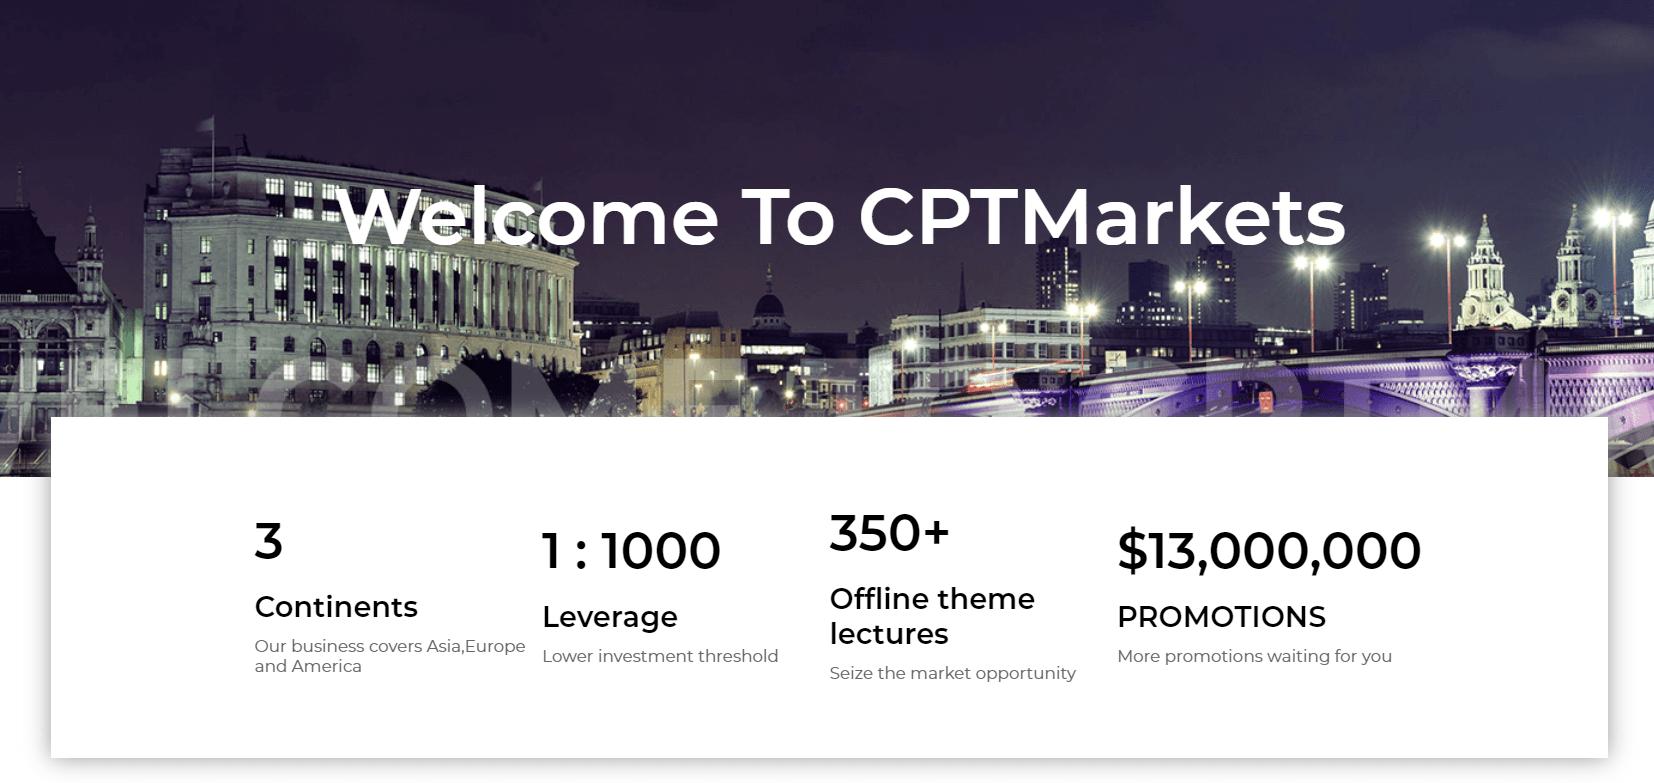 CPT Markets scam